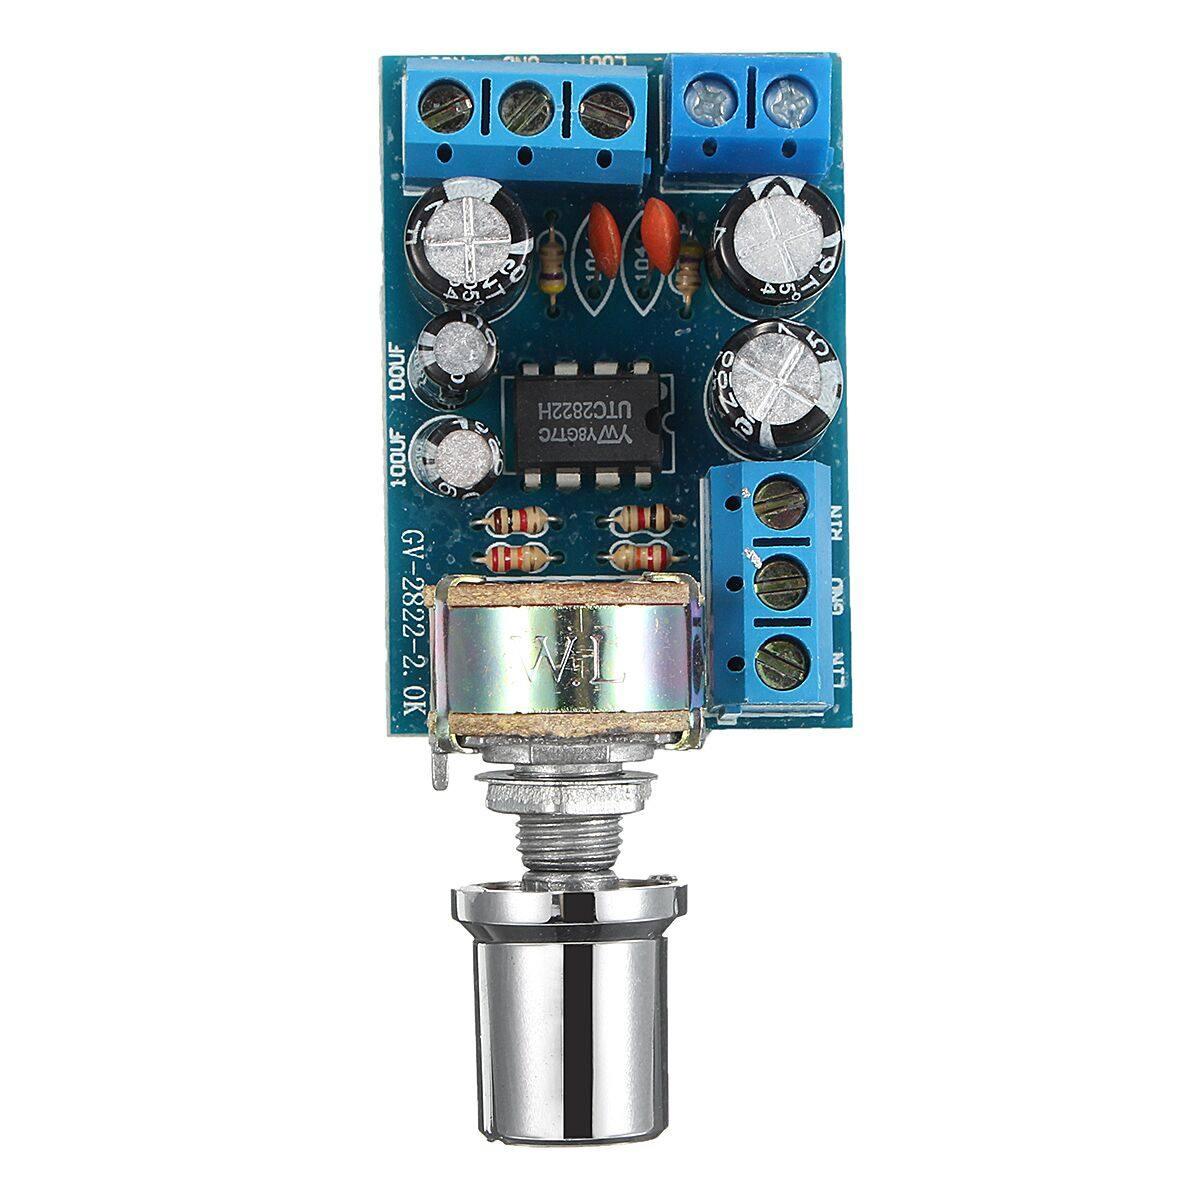 Online Shop Tda1521 Pure Class A Power Amplifier Board Analog Tda1521a Stereo Audio Circuit Tda2822m 20 Dual Channel Amp Aux Module Dc 18